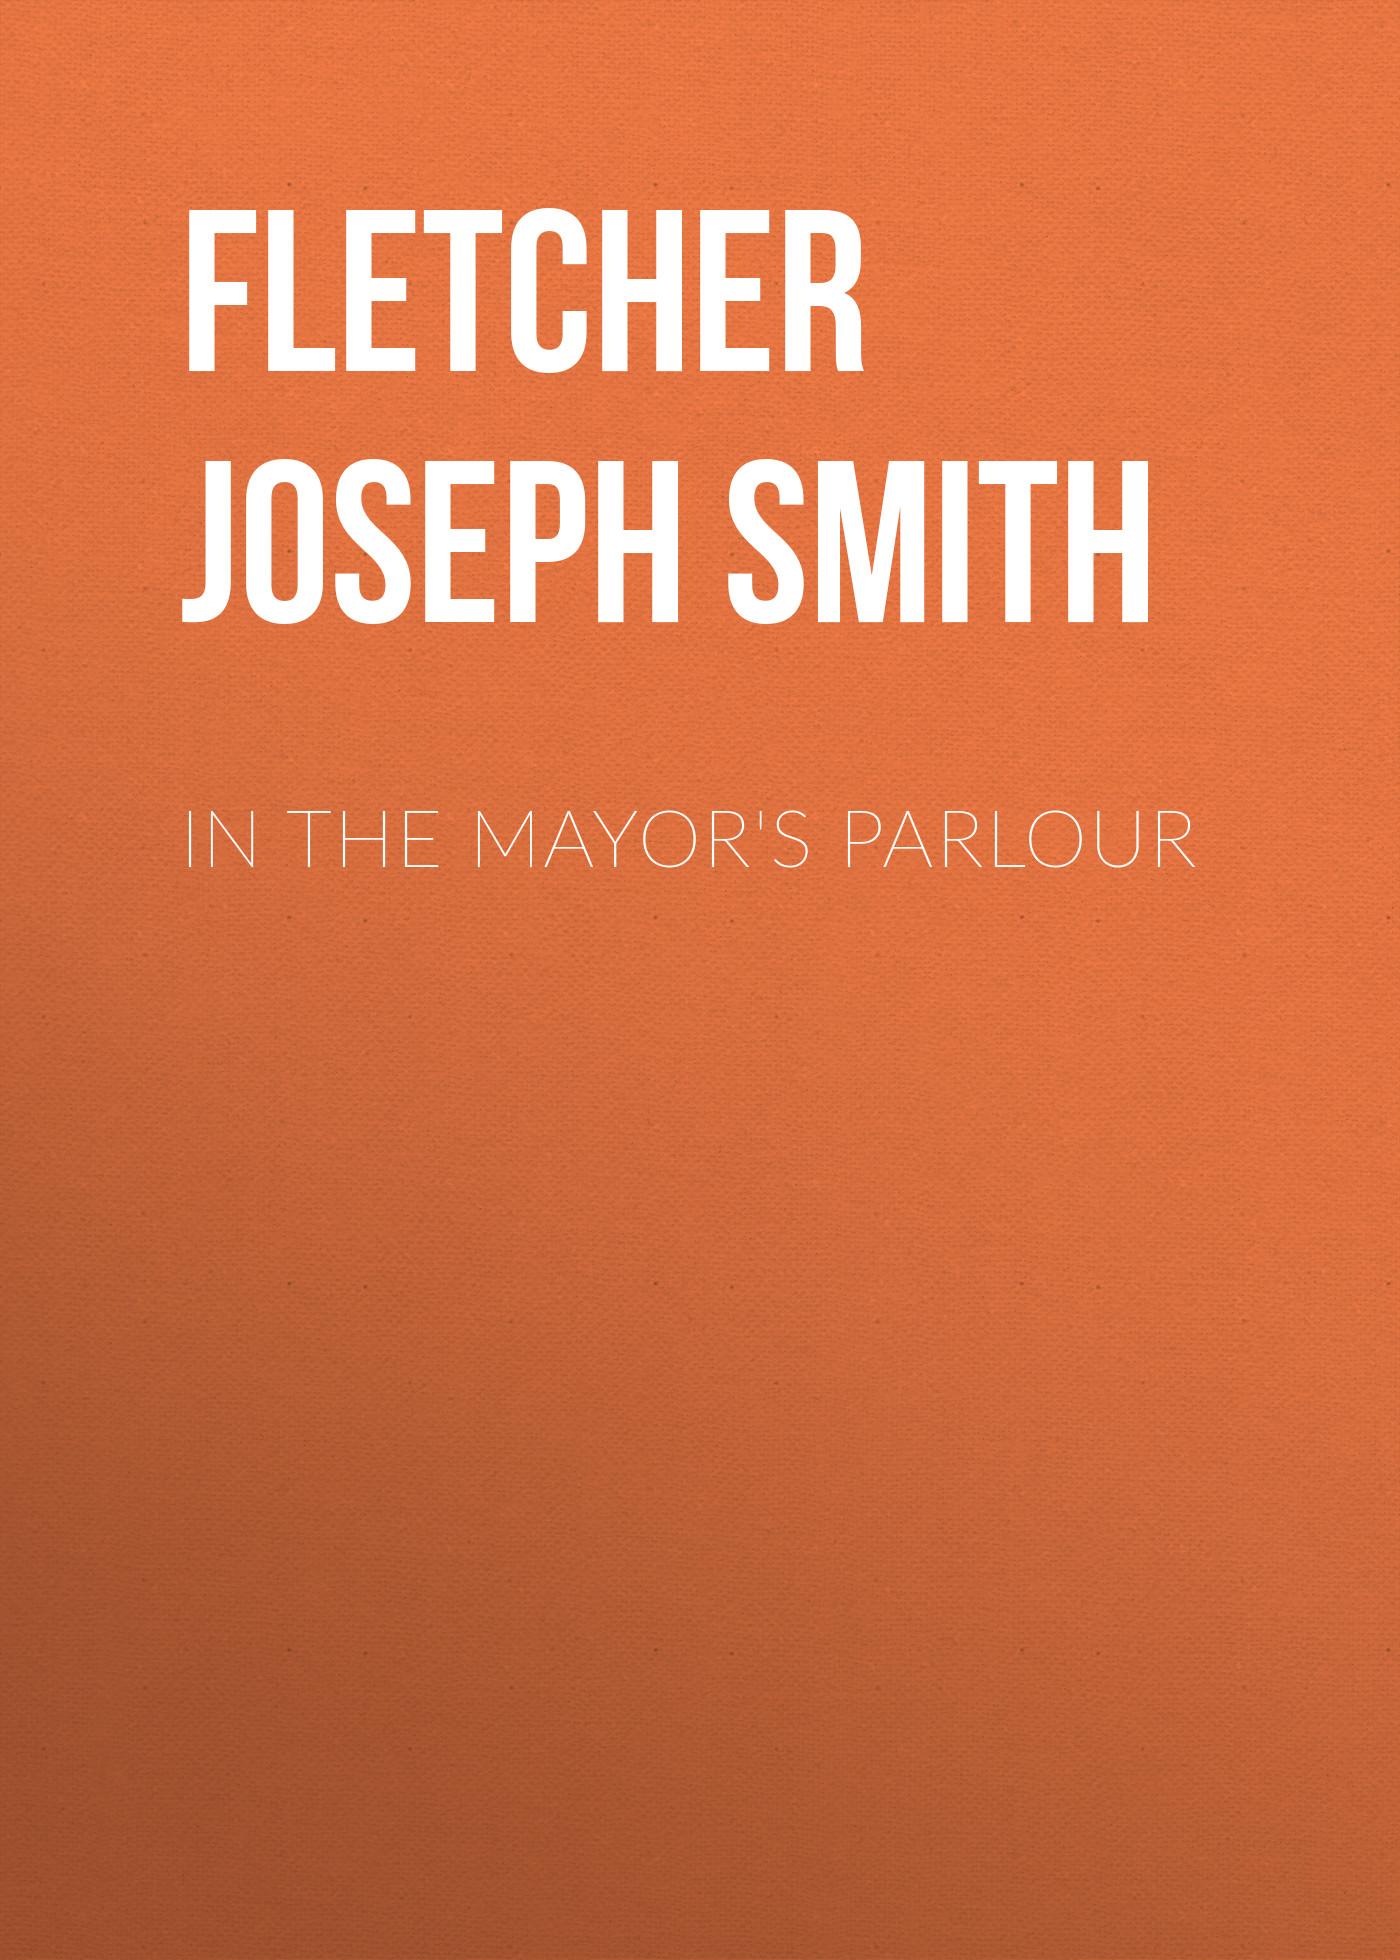 Fletcher Joseph Smith In the Mayor's Parlour fletcher joseph smith in the days of drake